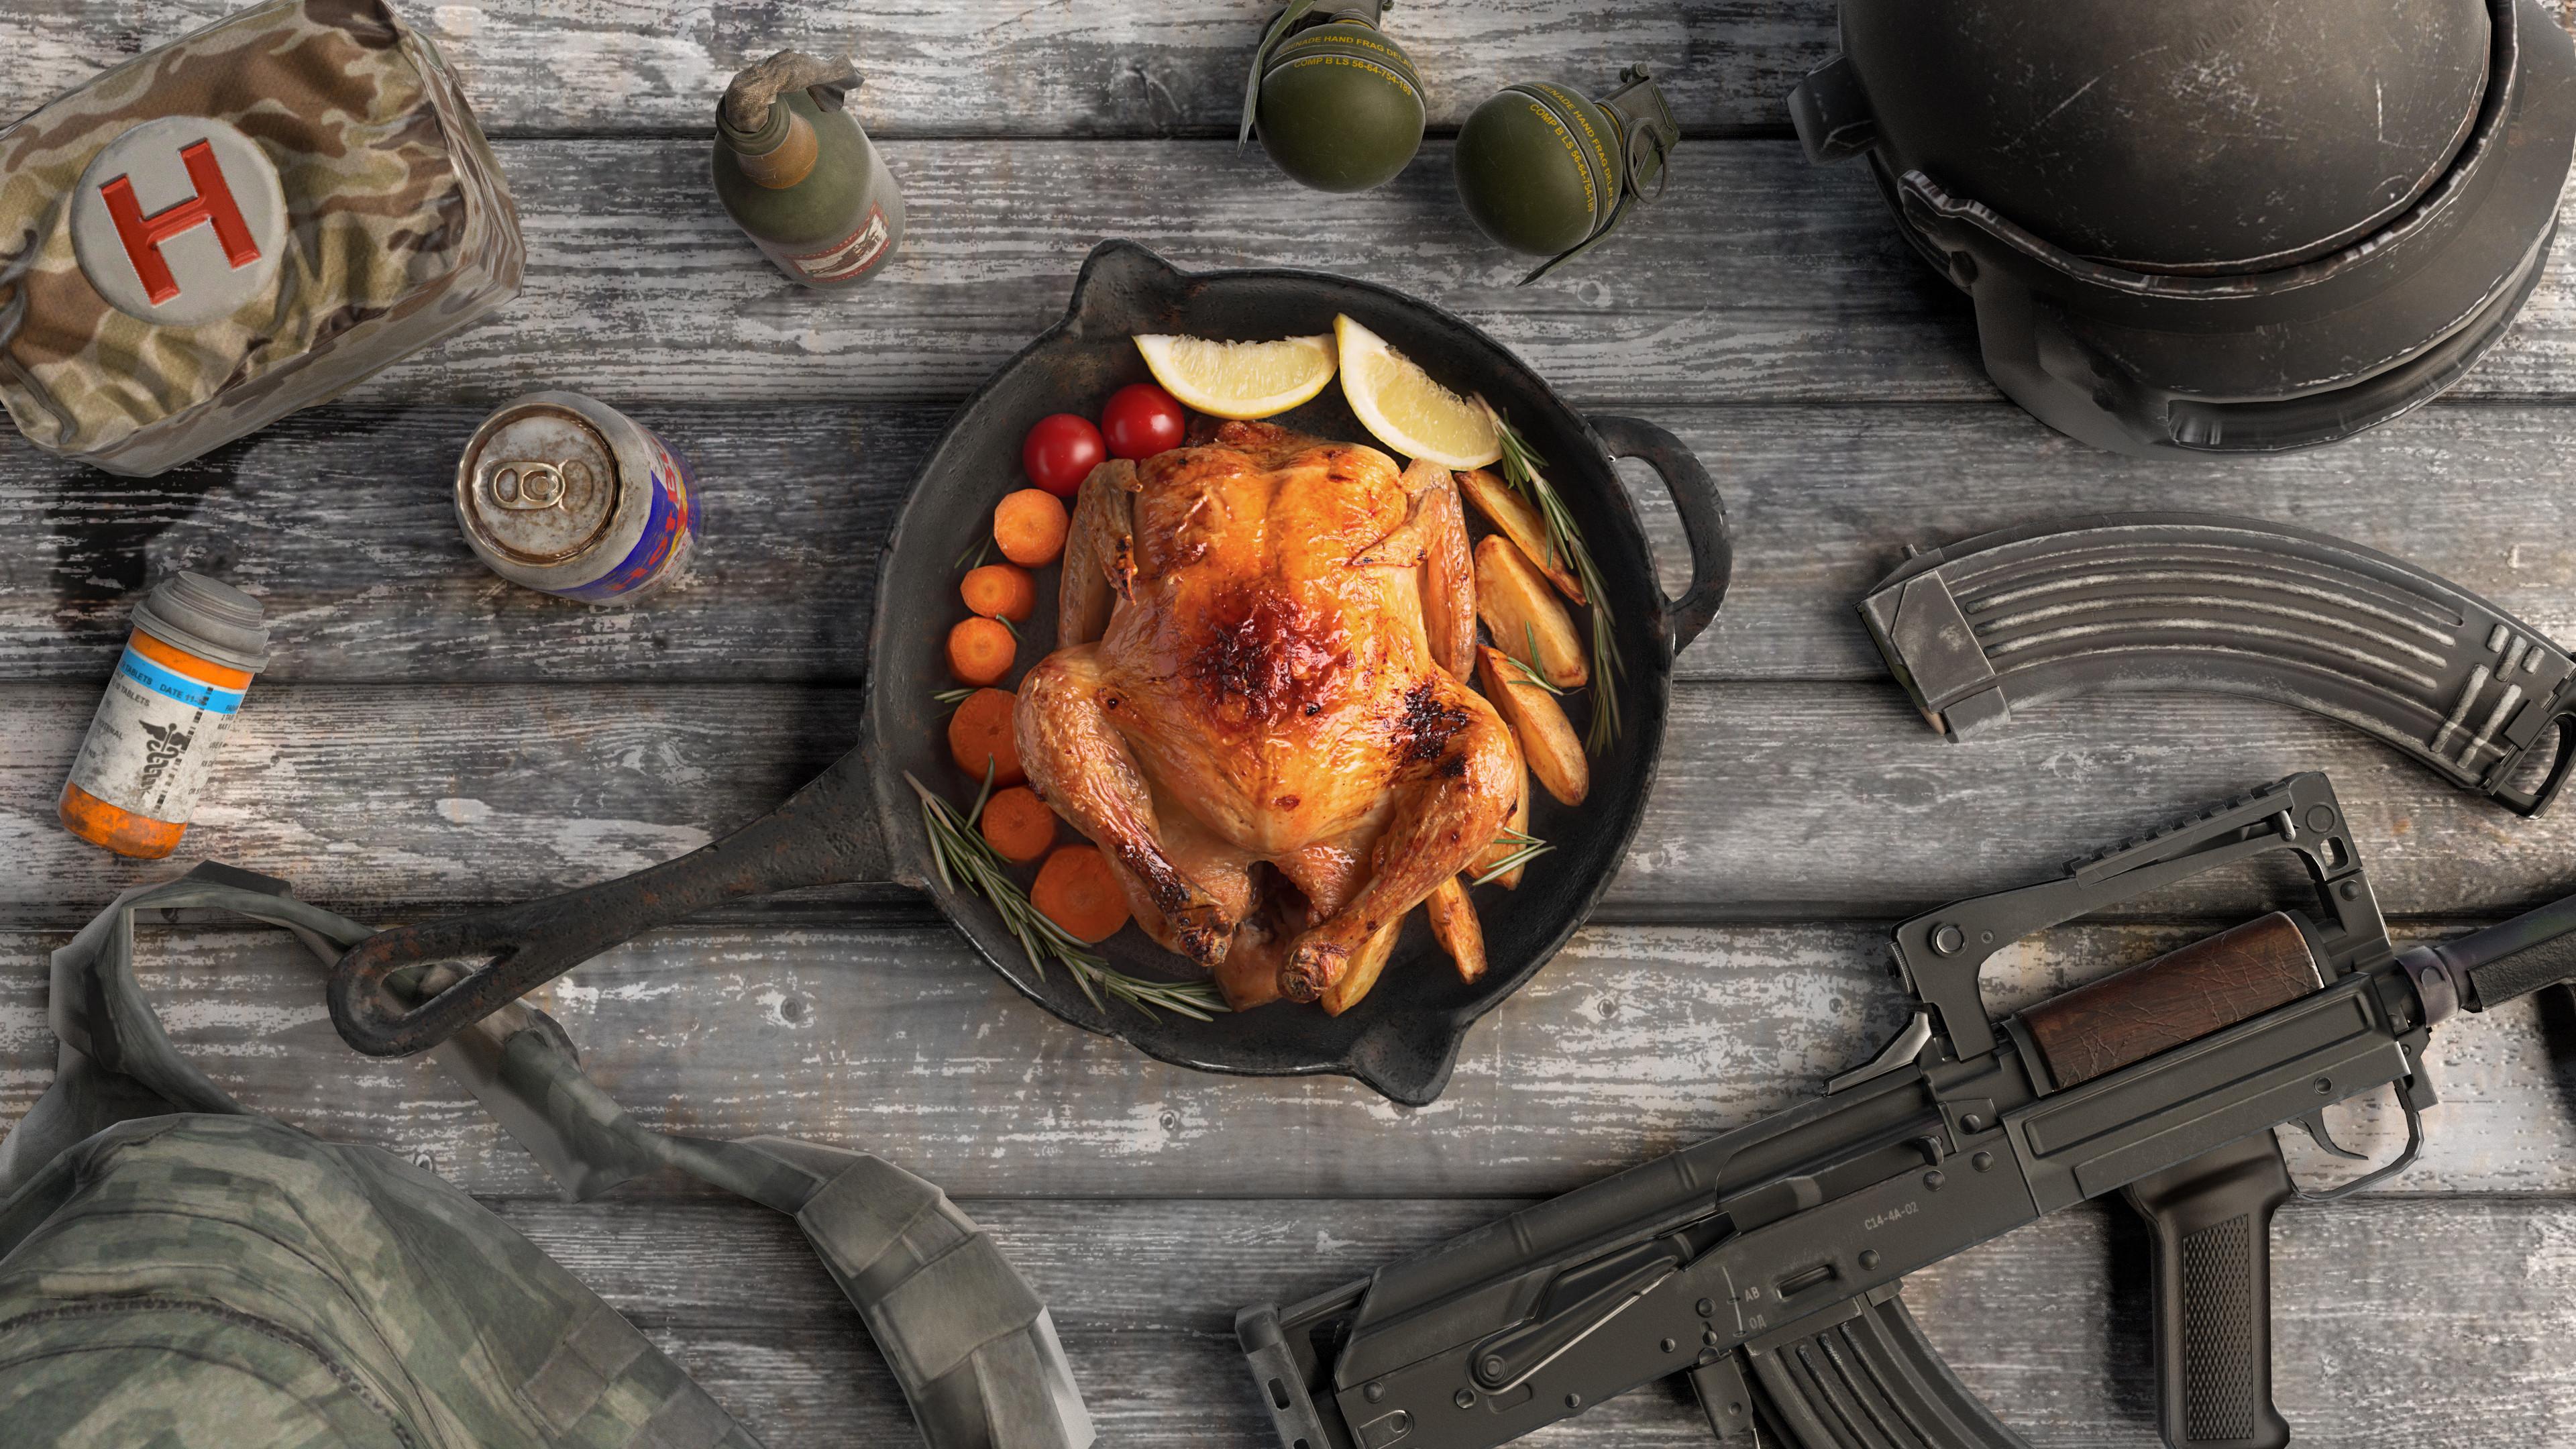 Pubg Chicken Dinner  PUBG Chicken Dinner Wallpaper PUBGHQ